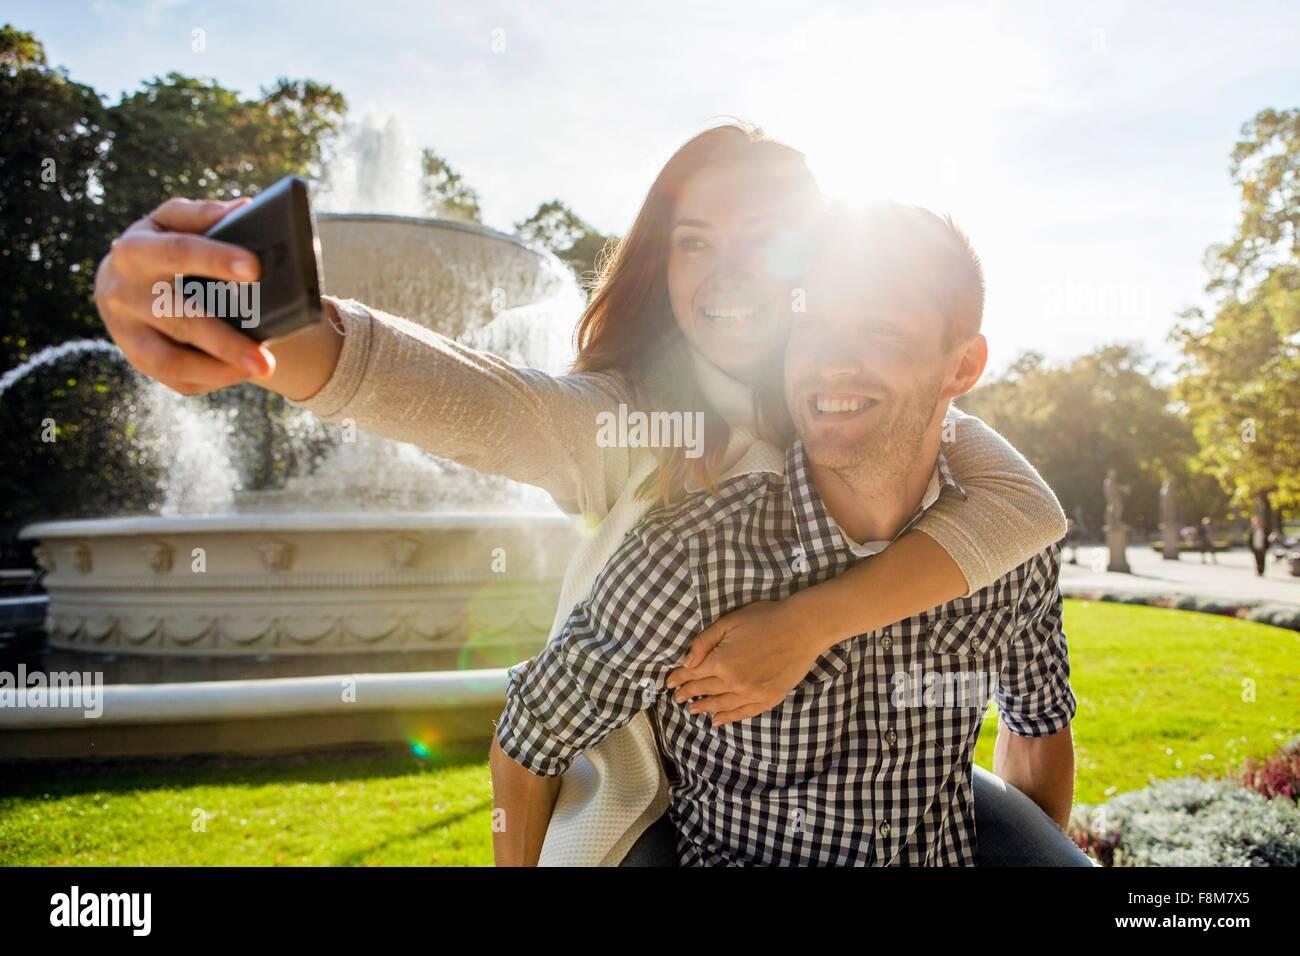 Woman taking selfie having a piggy back in park Stock Photo